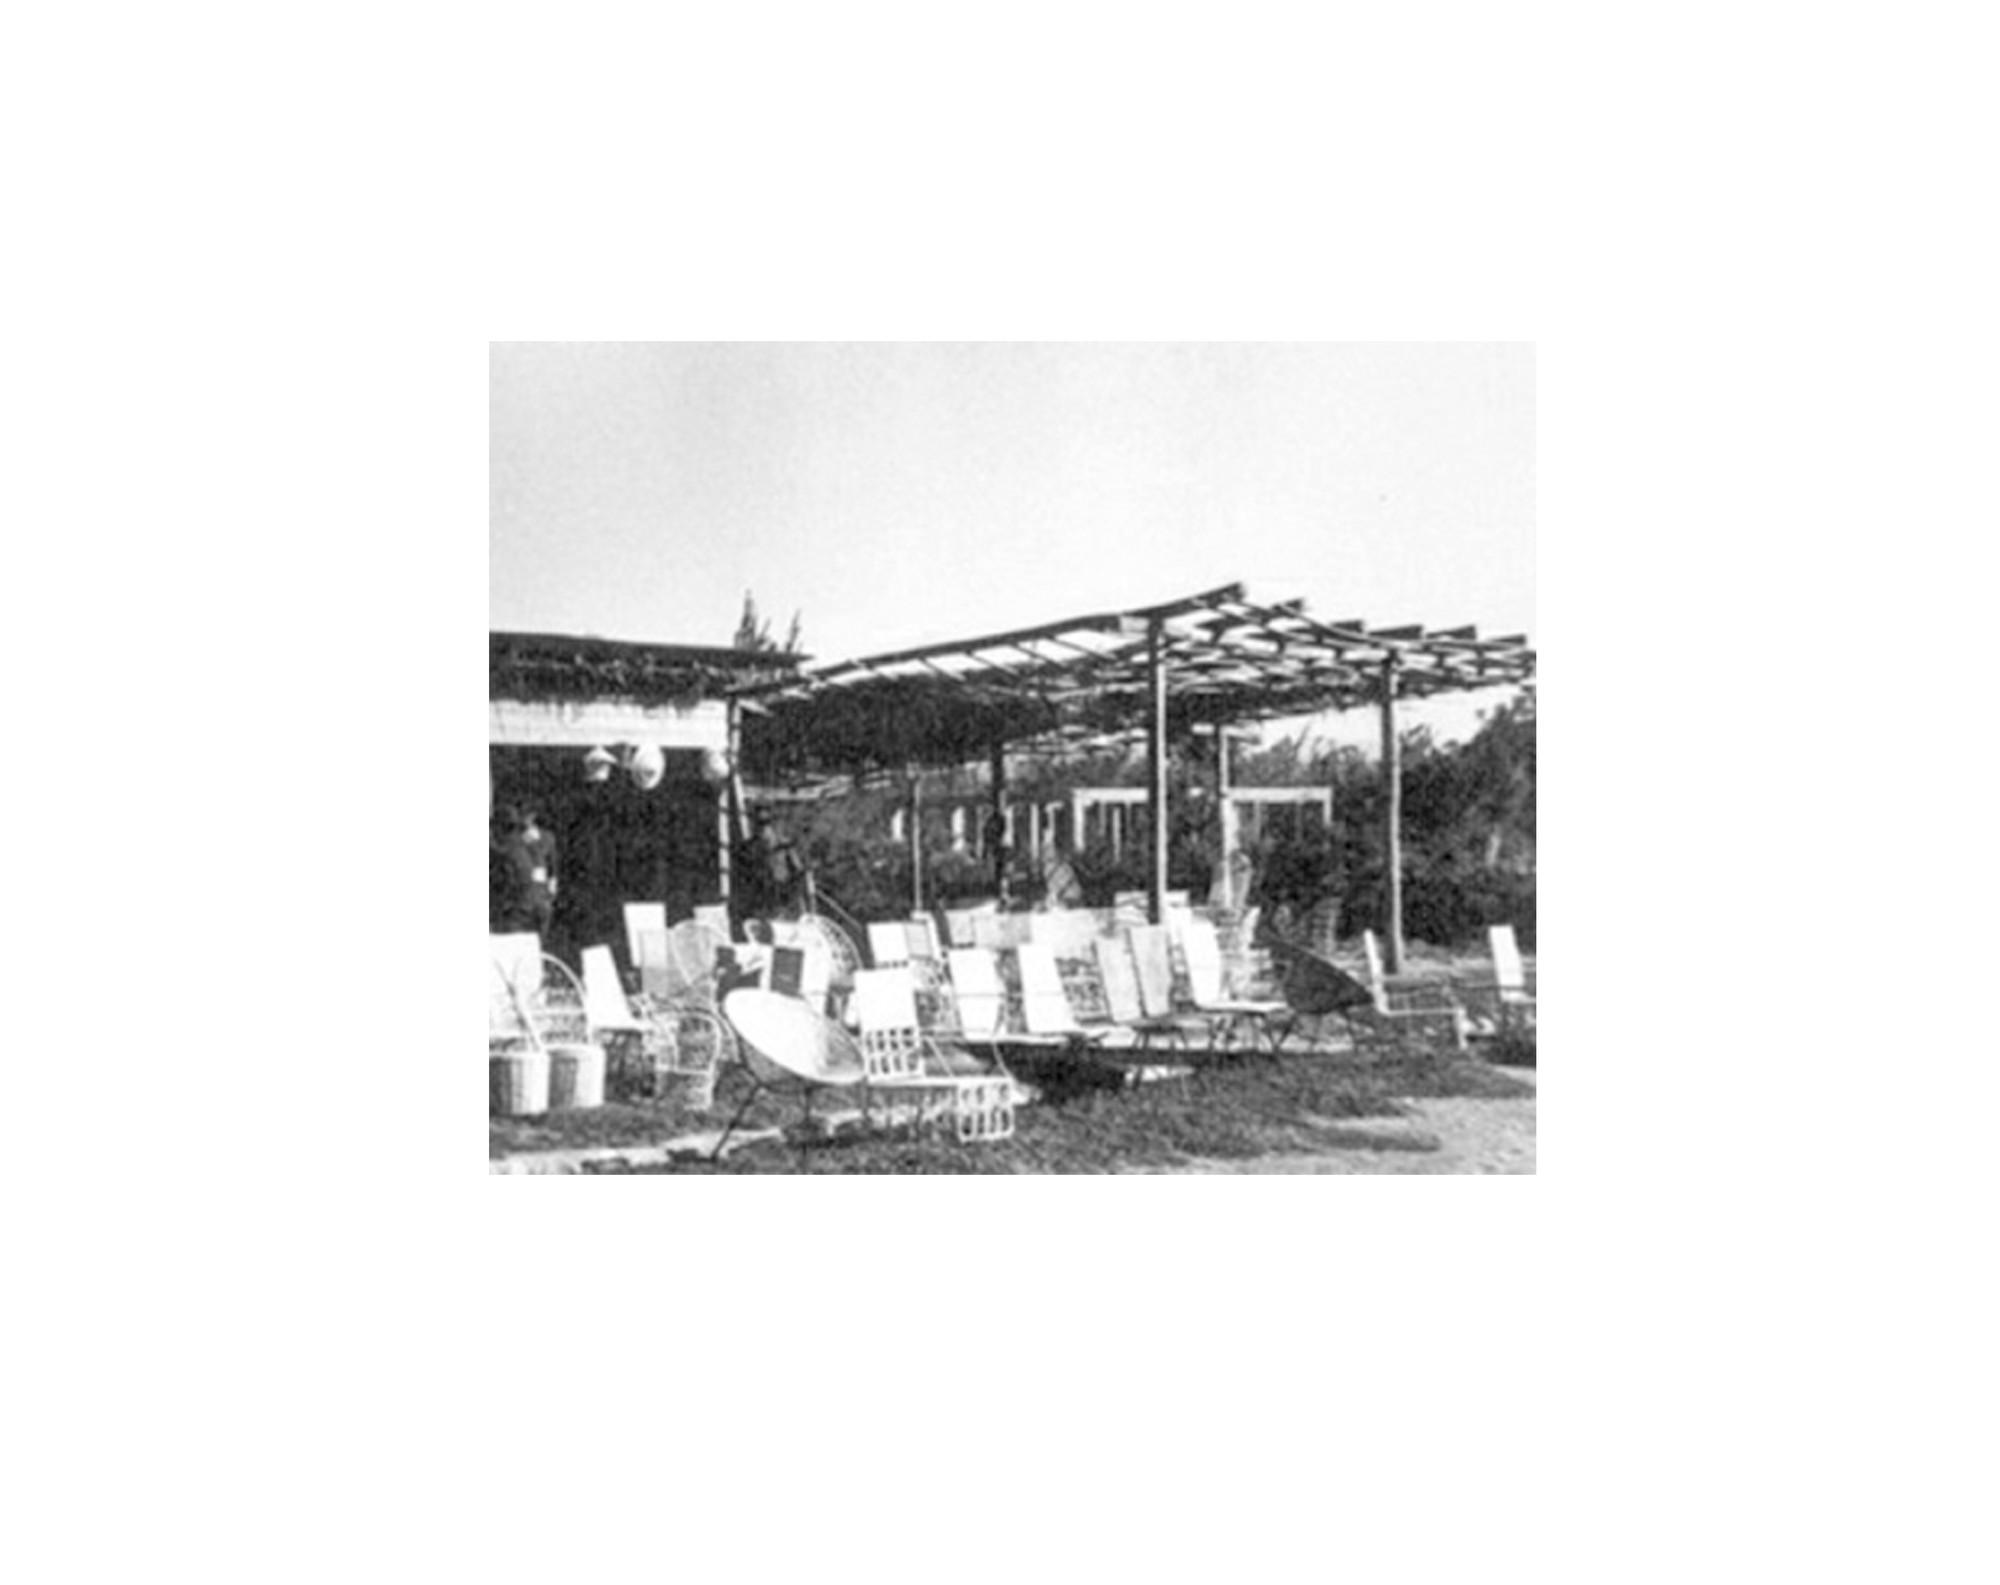 Foto histórica de Chimbarongo. Image Cortesia de Domingo Arancibia